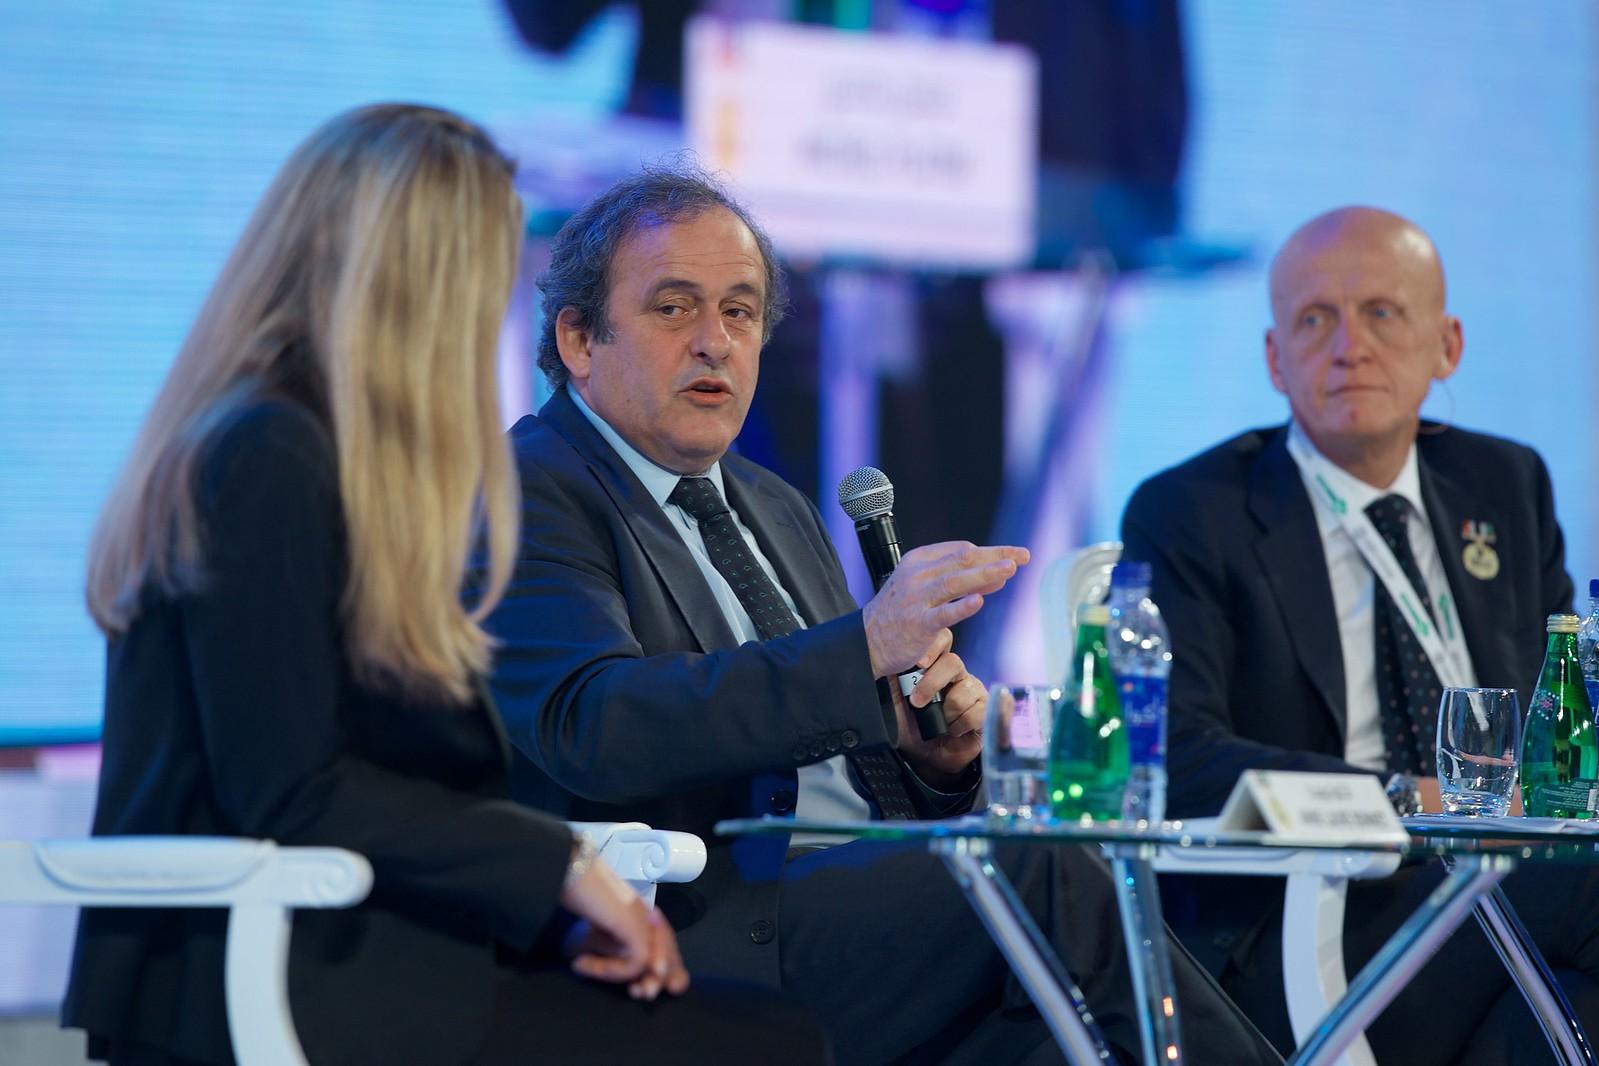 Michel Platini & Pierluigi Collina